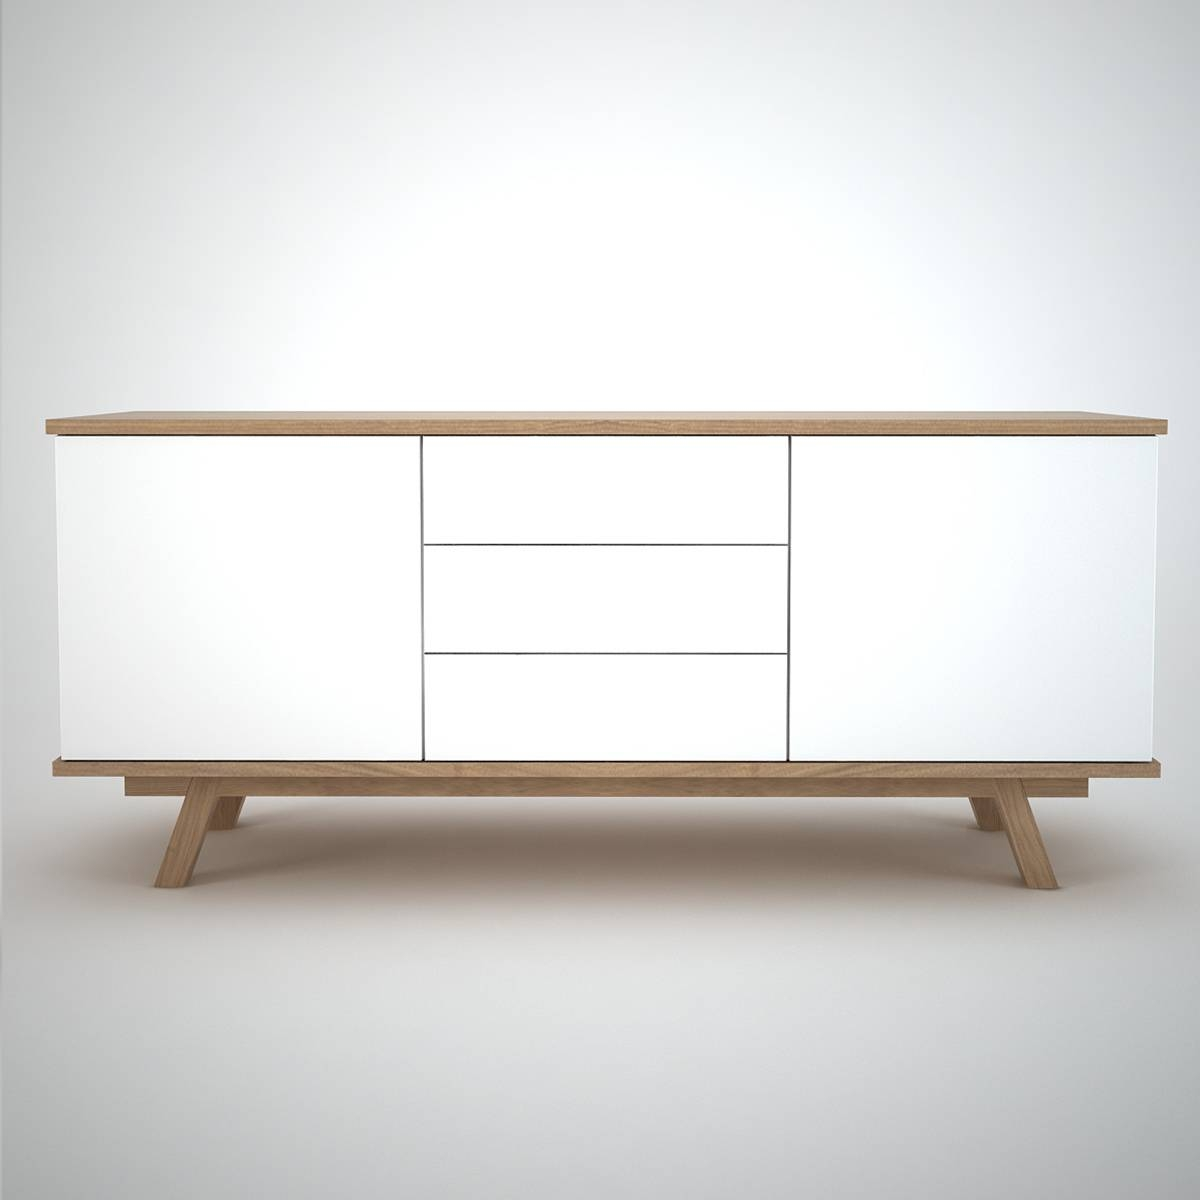 Ottawa Sideboard (2+3) White - Join Furniture pertaining to White Sideboard Furniture (Image 17 of 30)